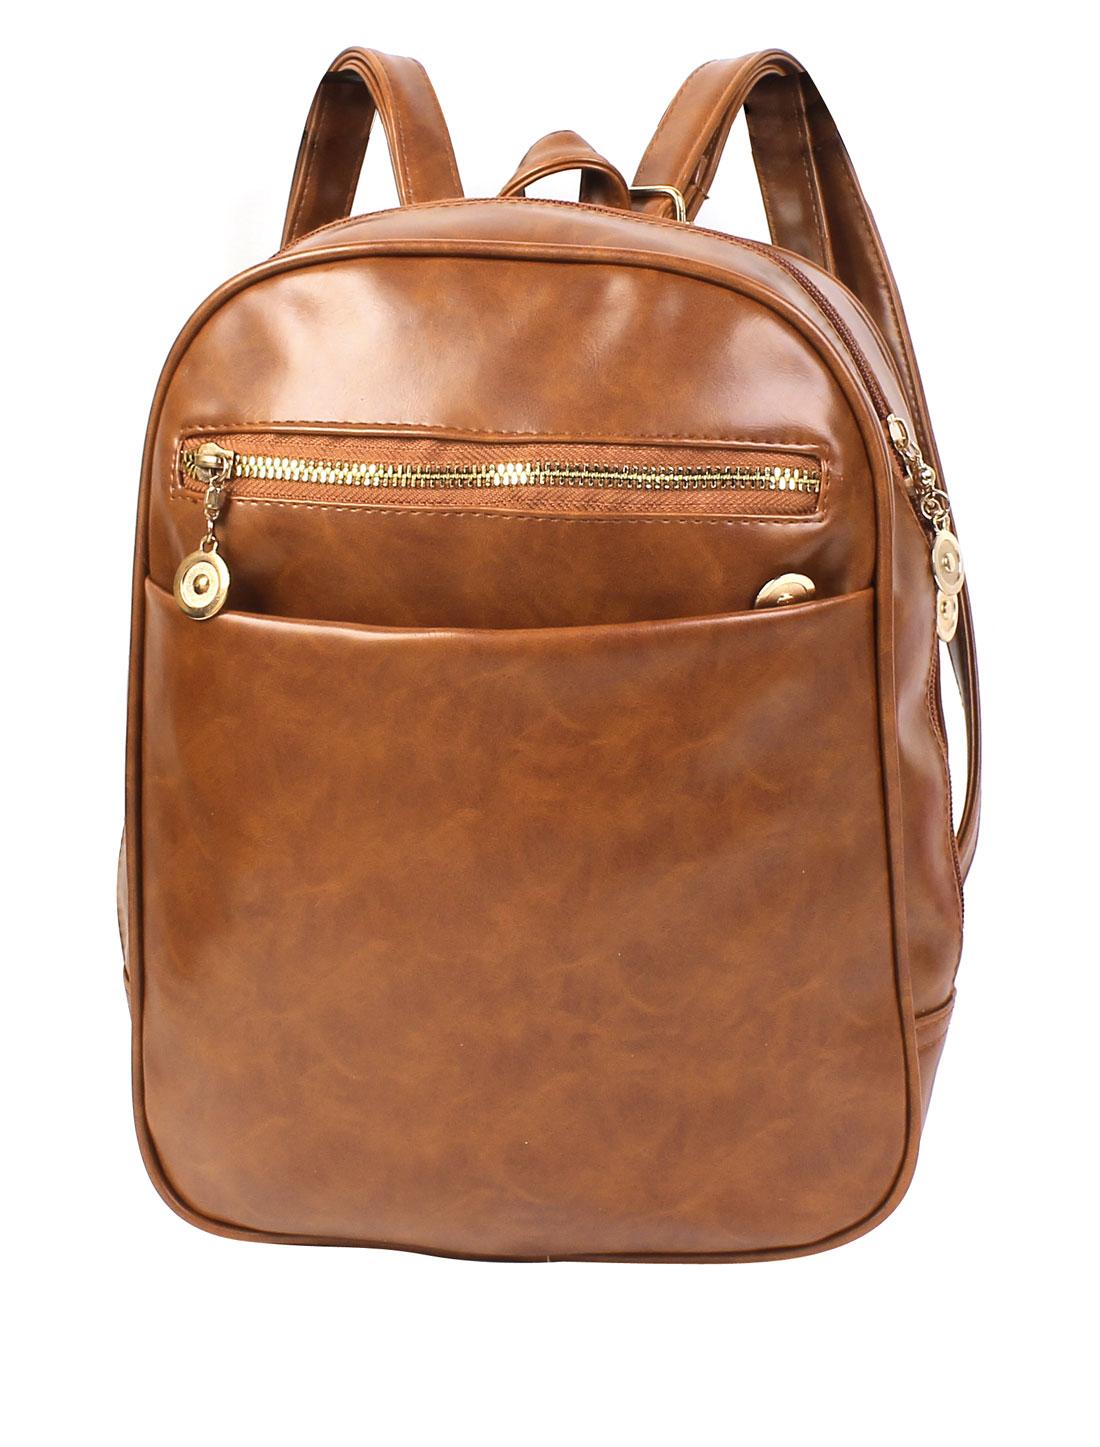 Women Zipper Closure Faux Leather School Bookbag Tote Backpack Brown